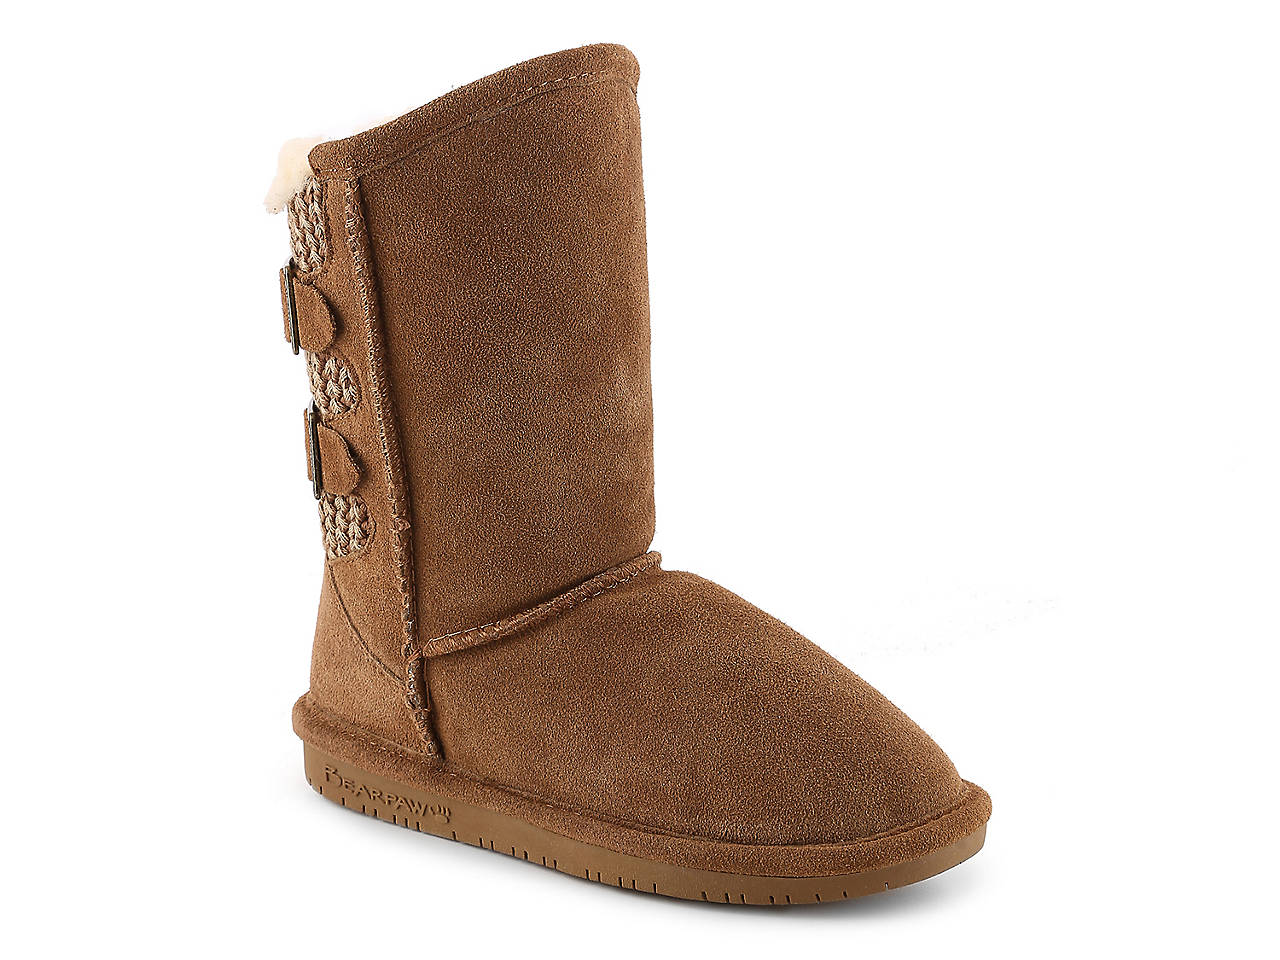 206609fd29c Bearpaw Boshie Youth Boot Kids Shoes